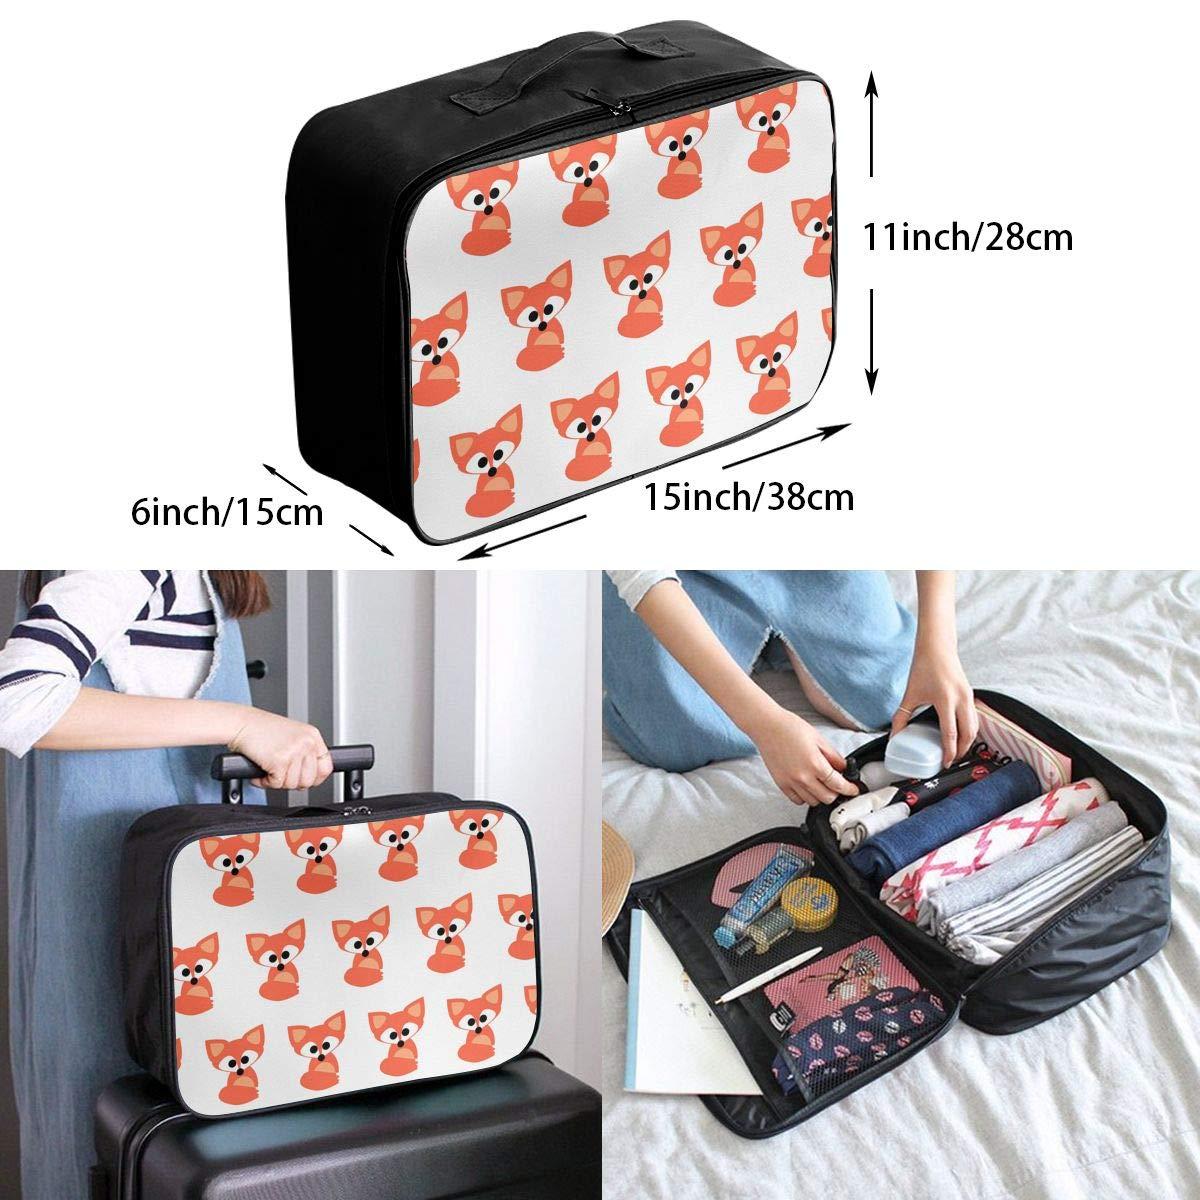 Travel Luggage Duffle Bag Lightweight Portable Handbag Cute Fox Pattern Large Capacity Waterproof Foldable Storage Tote